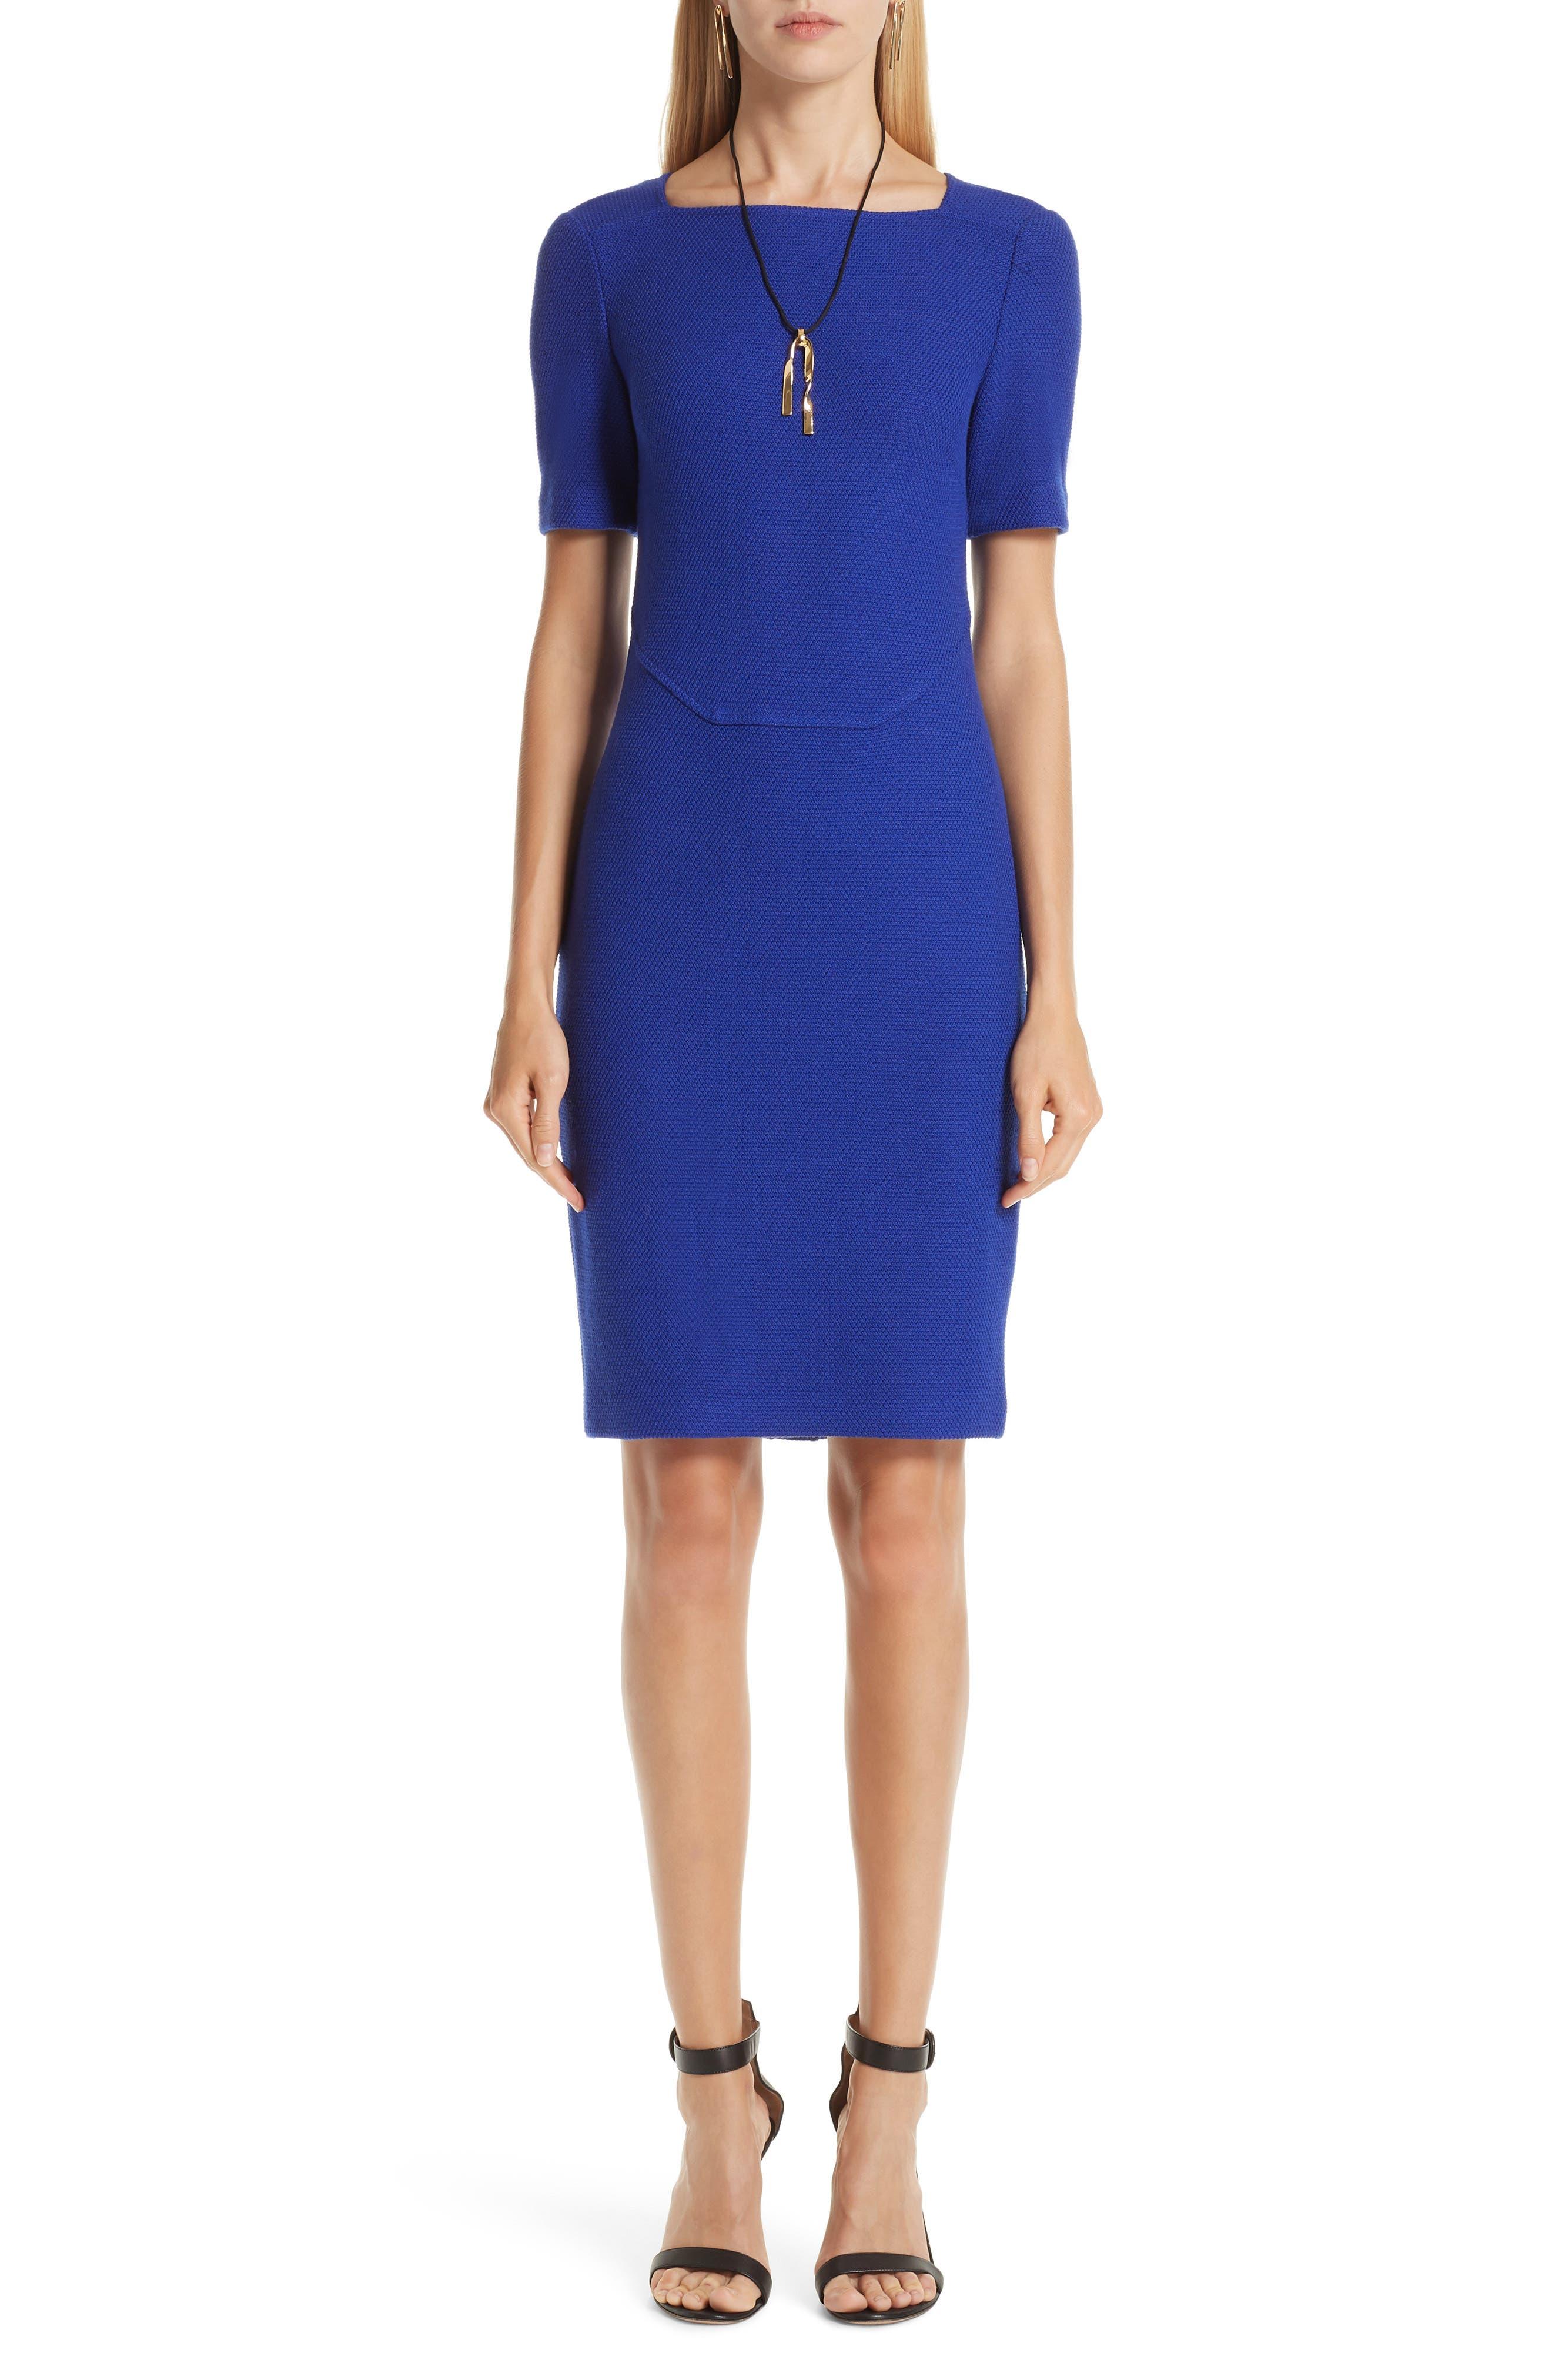 St. John Collection Irina Boucle Knit Square Neck Sheath Dress, Blue